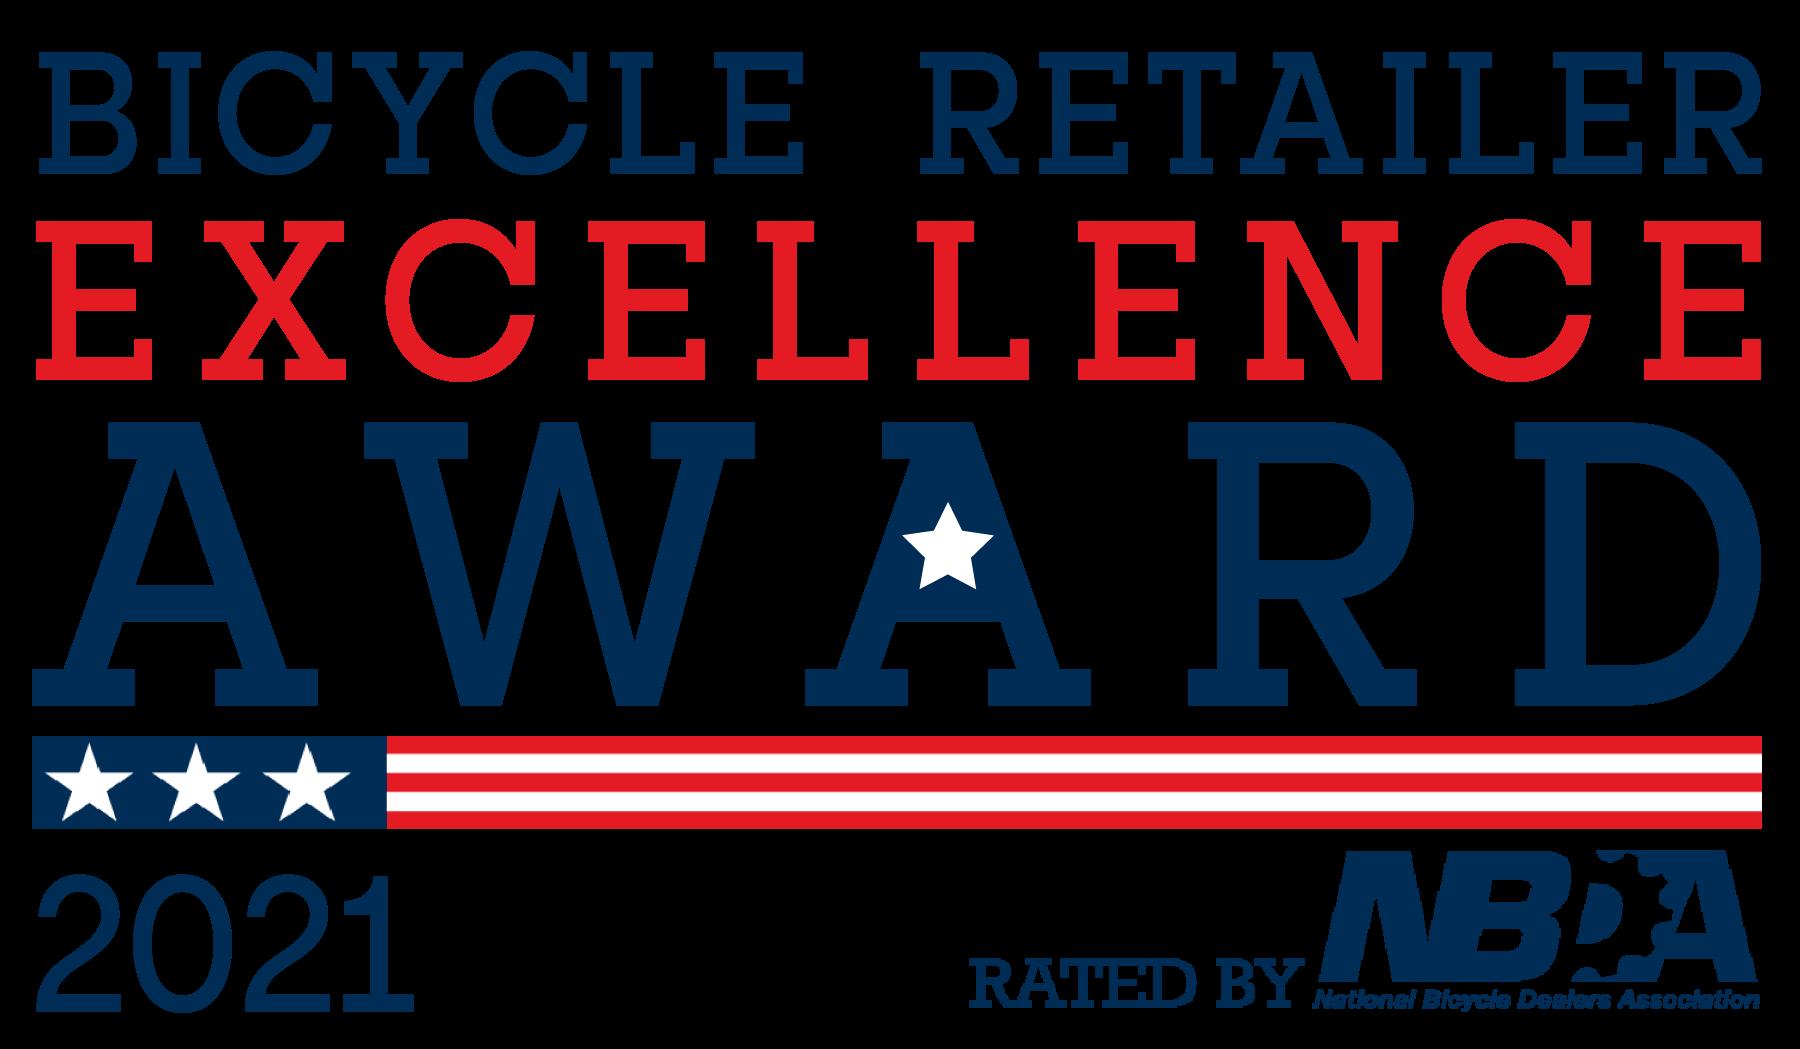 2021 Bicycle Retailer Excellence Award